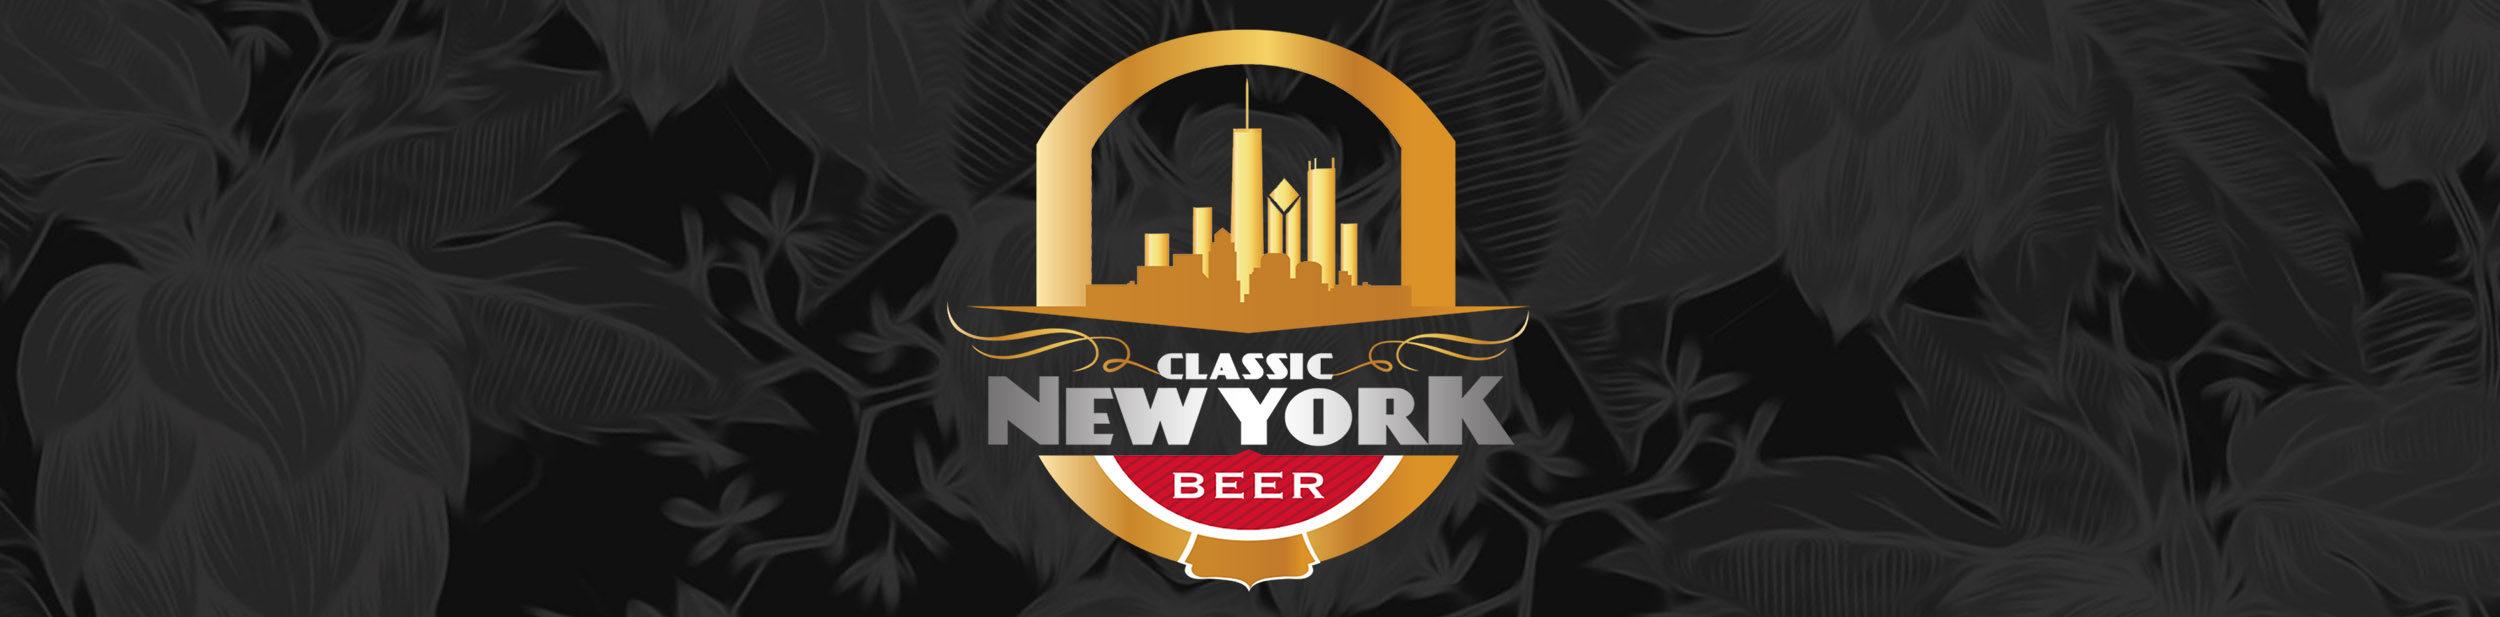 Classic New York Beer